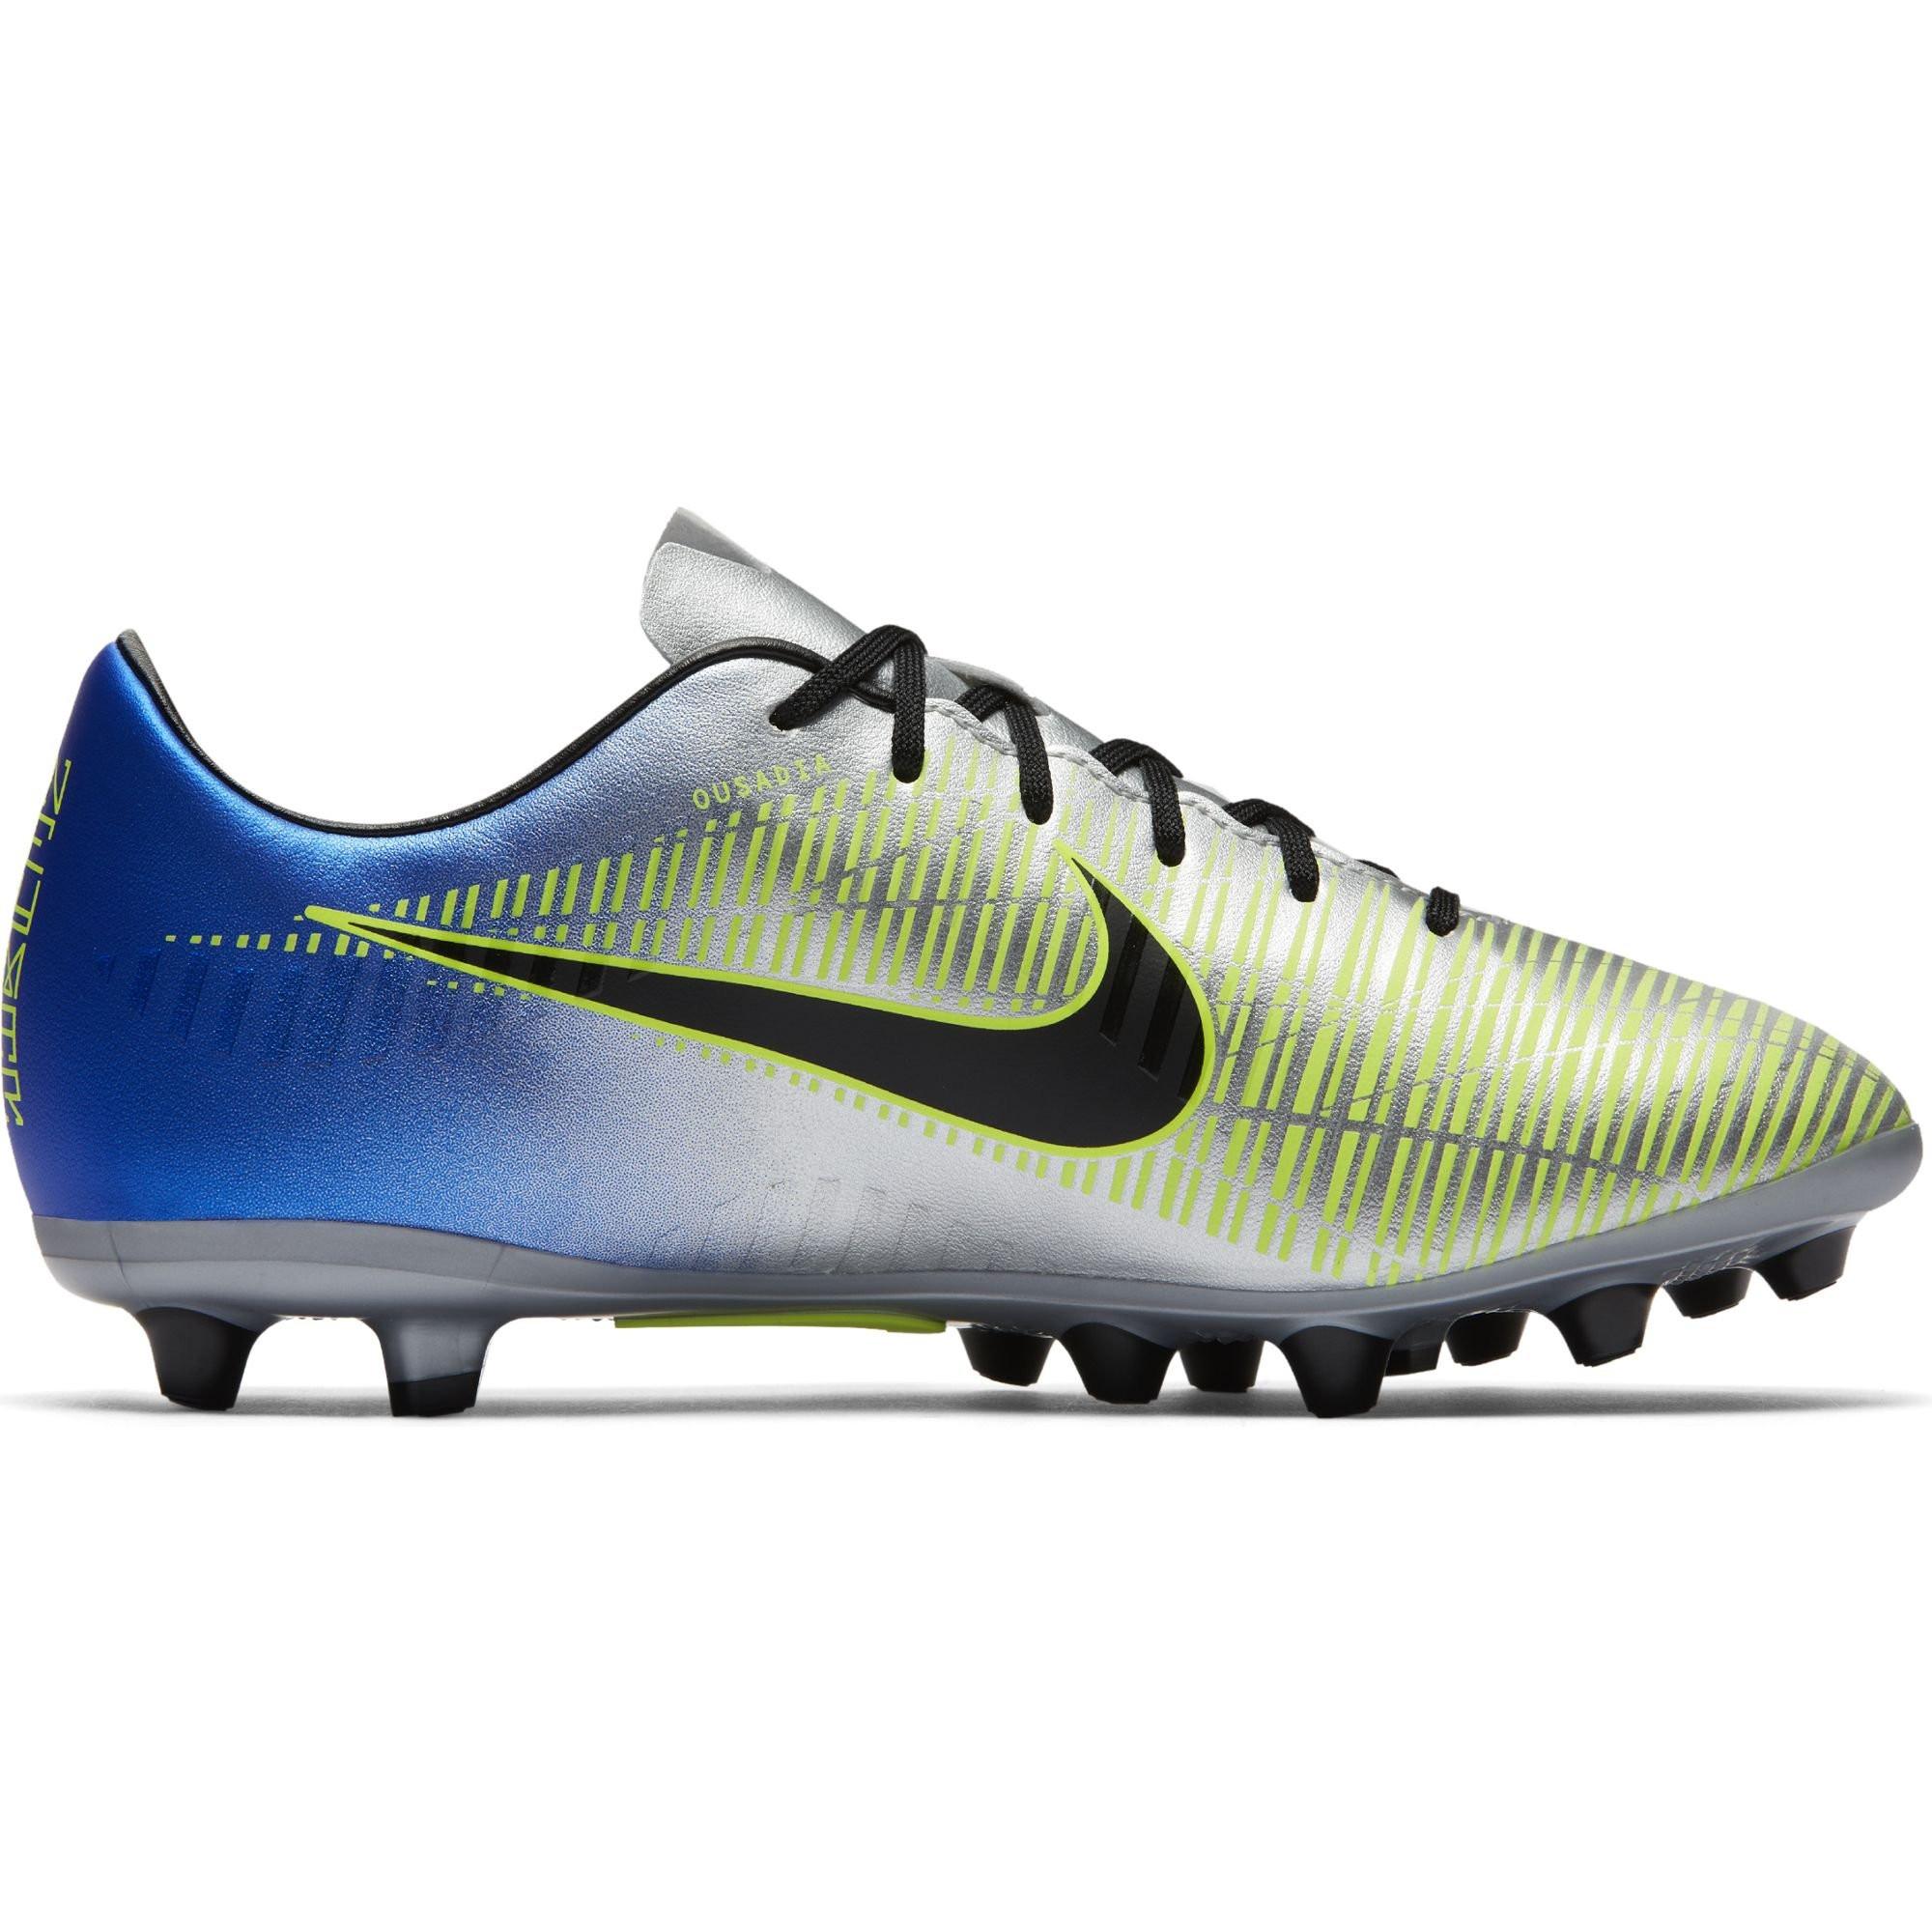 Nike mercurial victory 6 njr agpro jr nike chaussures for Univers du jardin maule 78